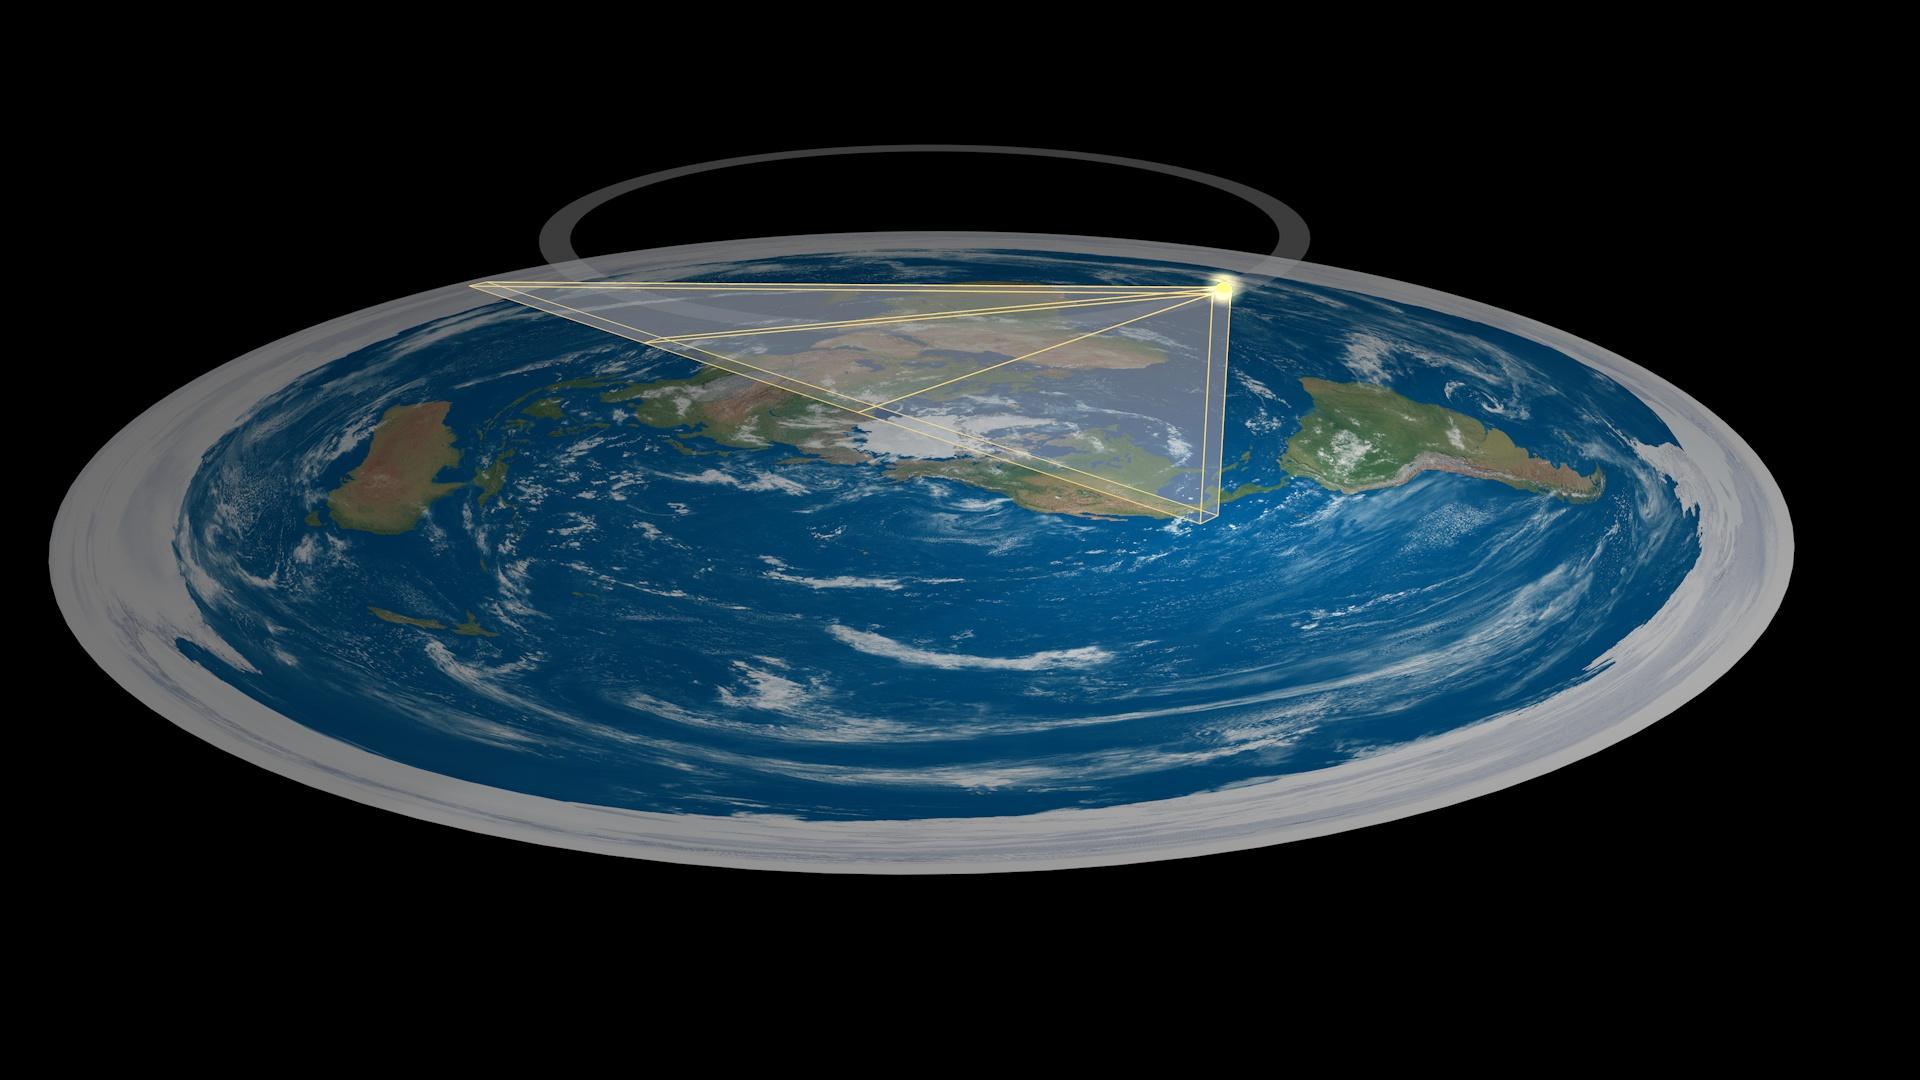 flat-earth-2.jpg